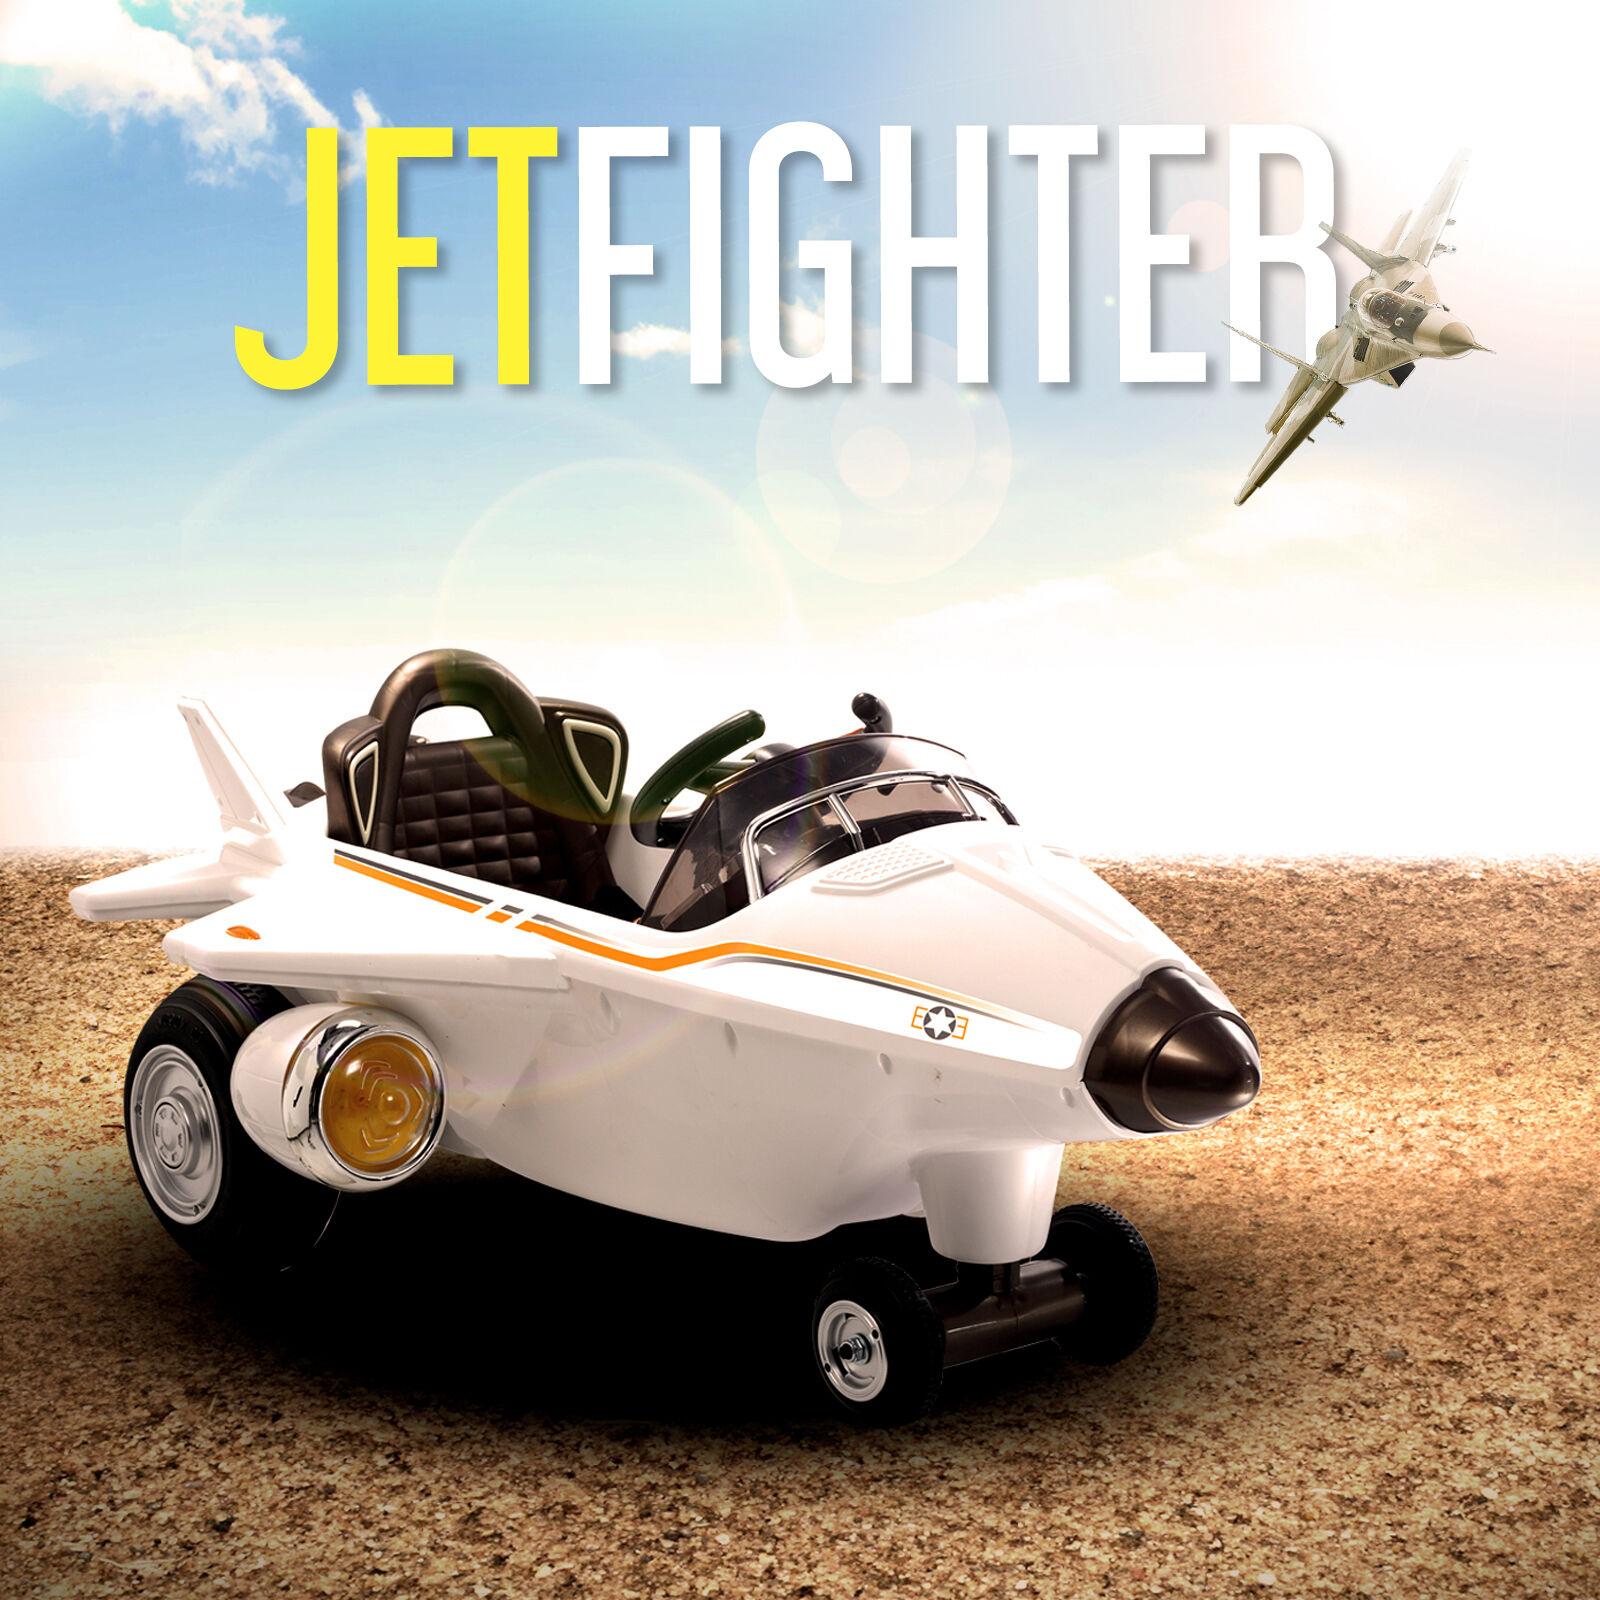 Kids Ride On Airplane Airplane Airplane Battery Plane Jet 12V Electric Car Parental Remote Mp3 ec888c